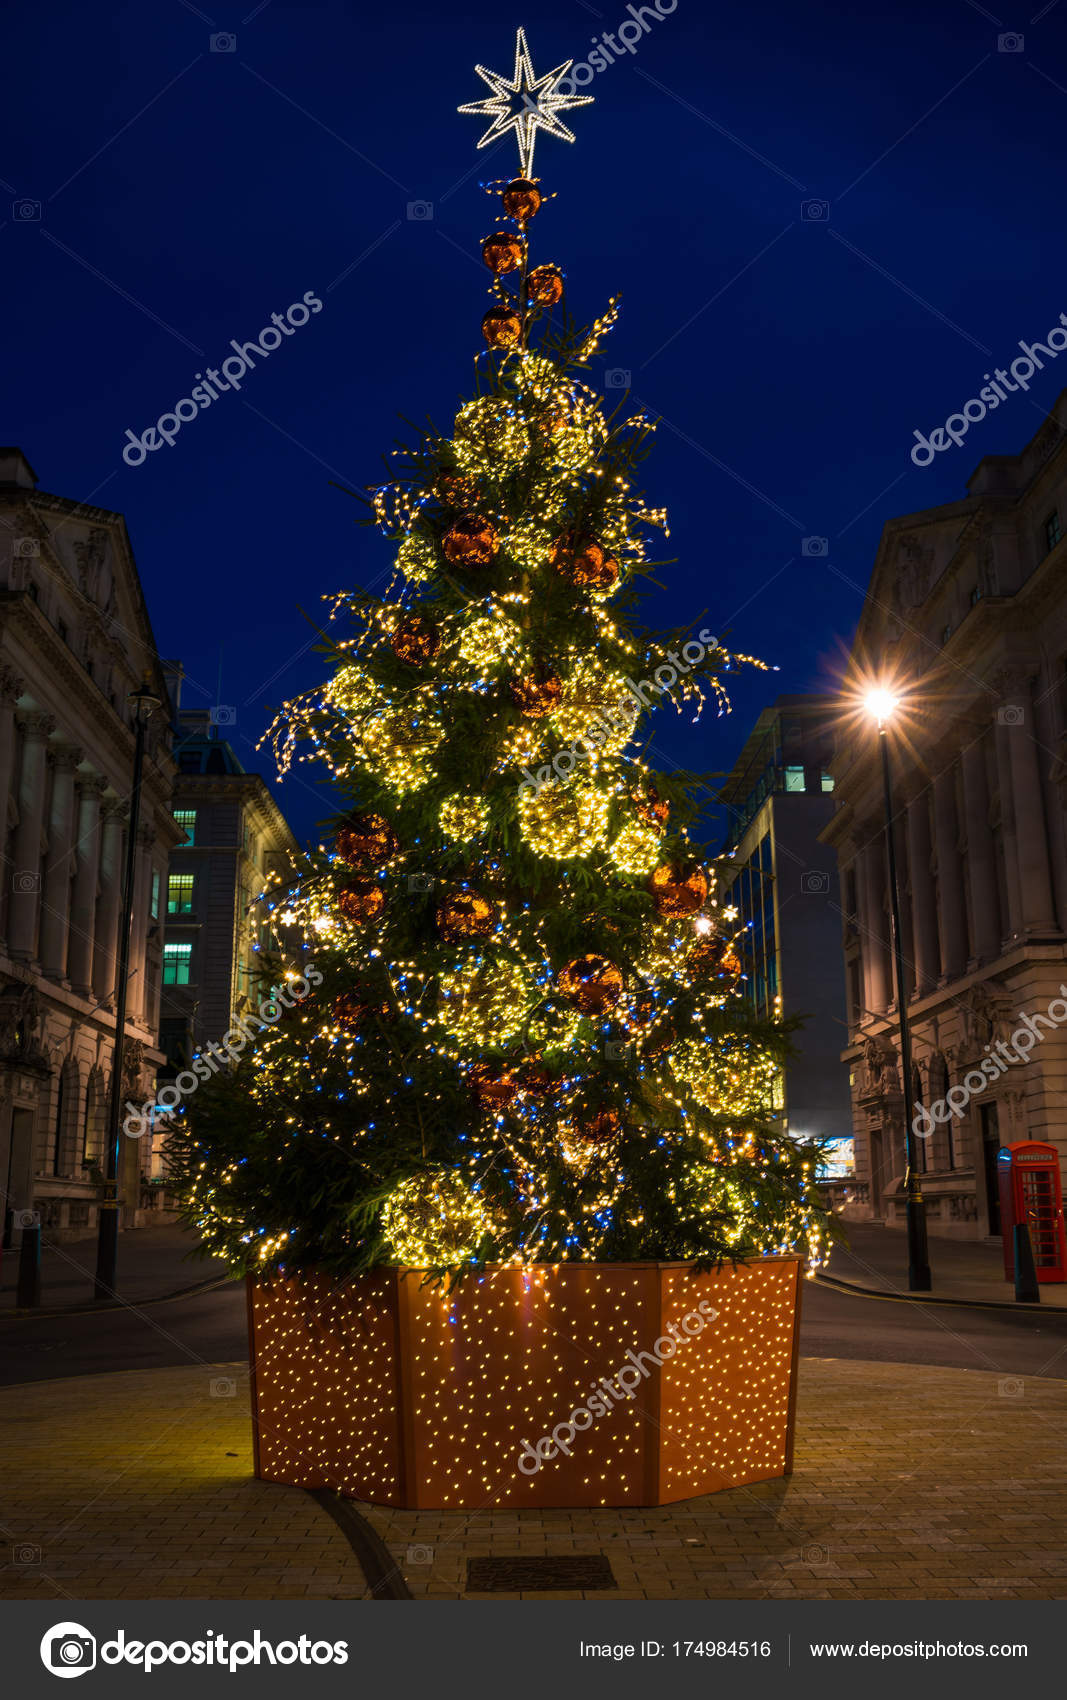 England Christmas Tree.Christmas Tree On Waterloo Place In London England Stock